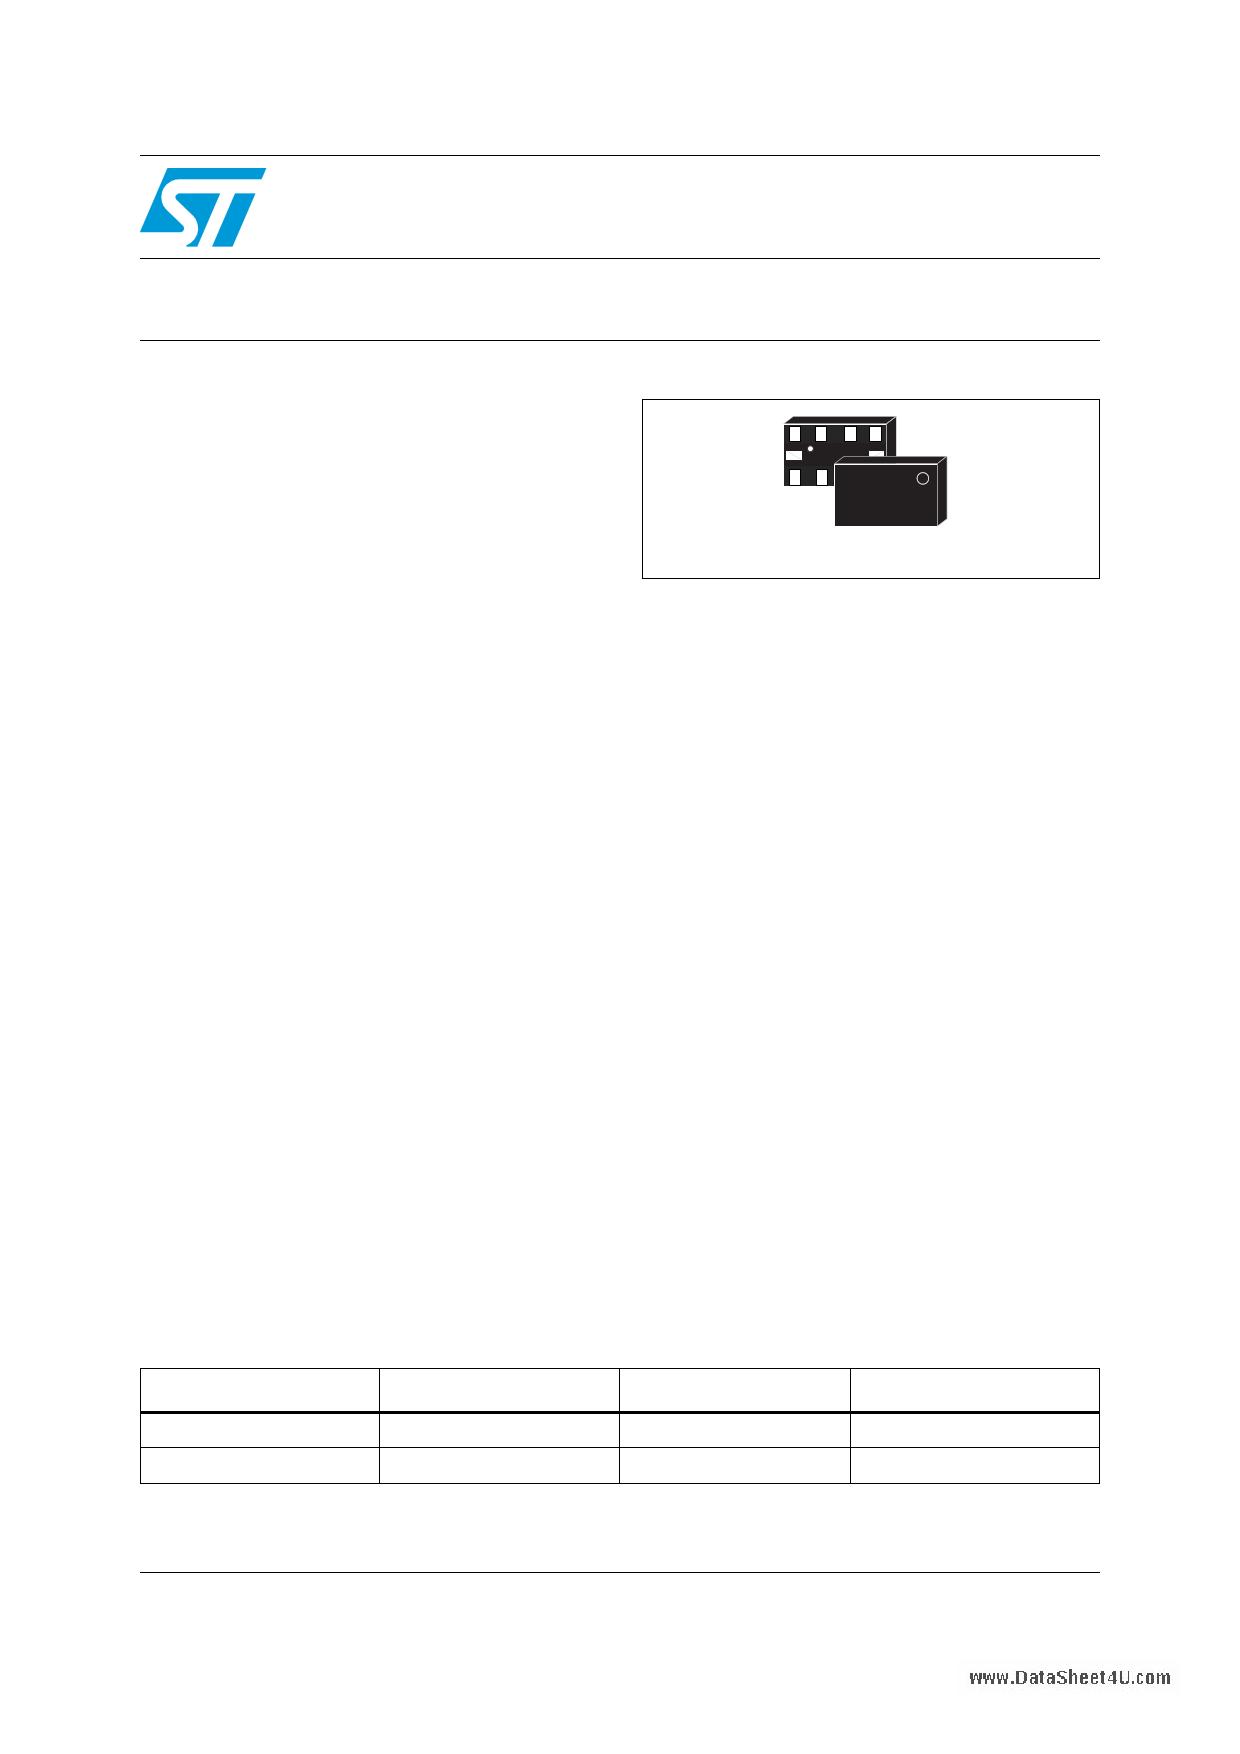 LY3200ALH دیتاشیت PDF